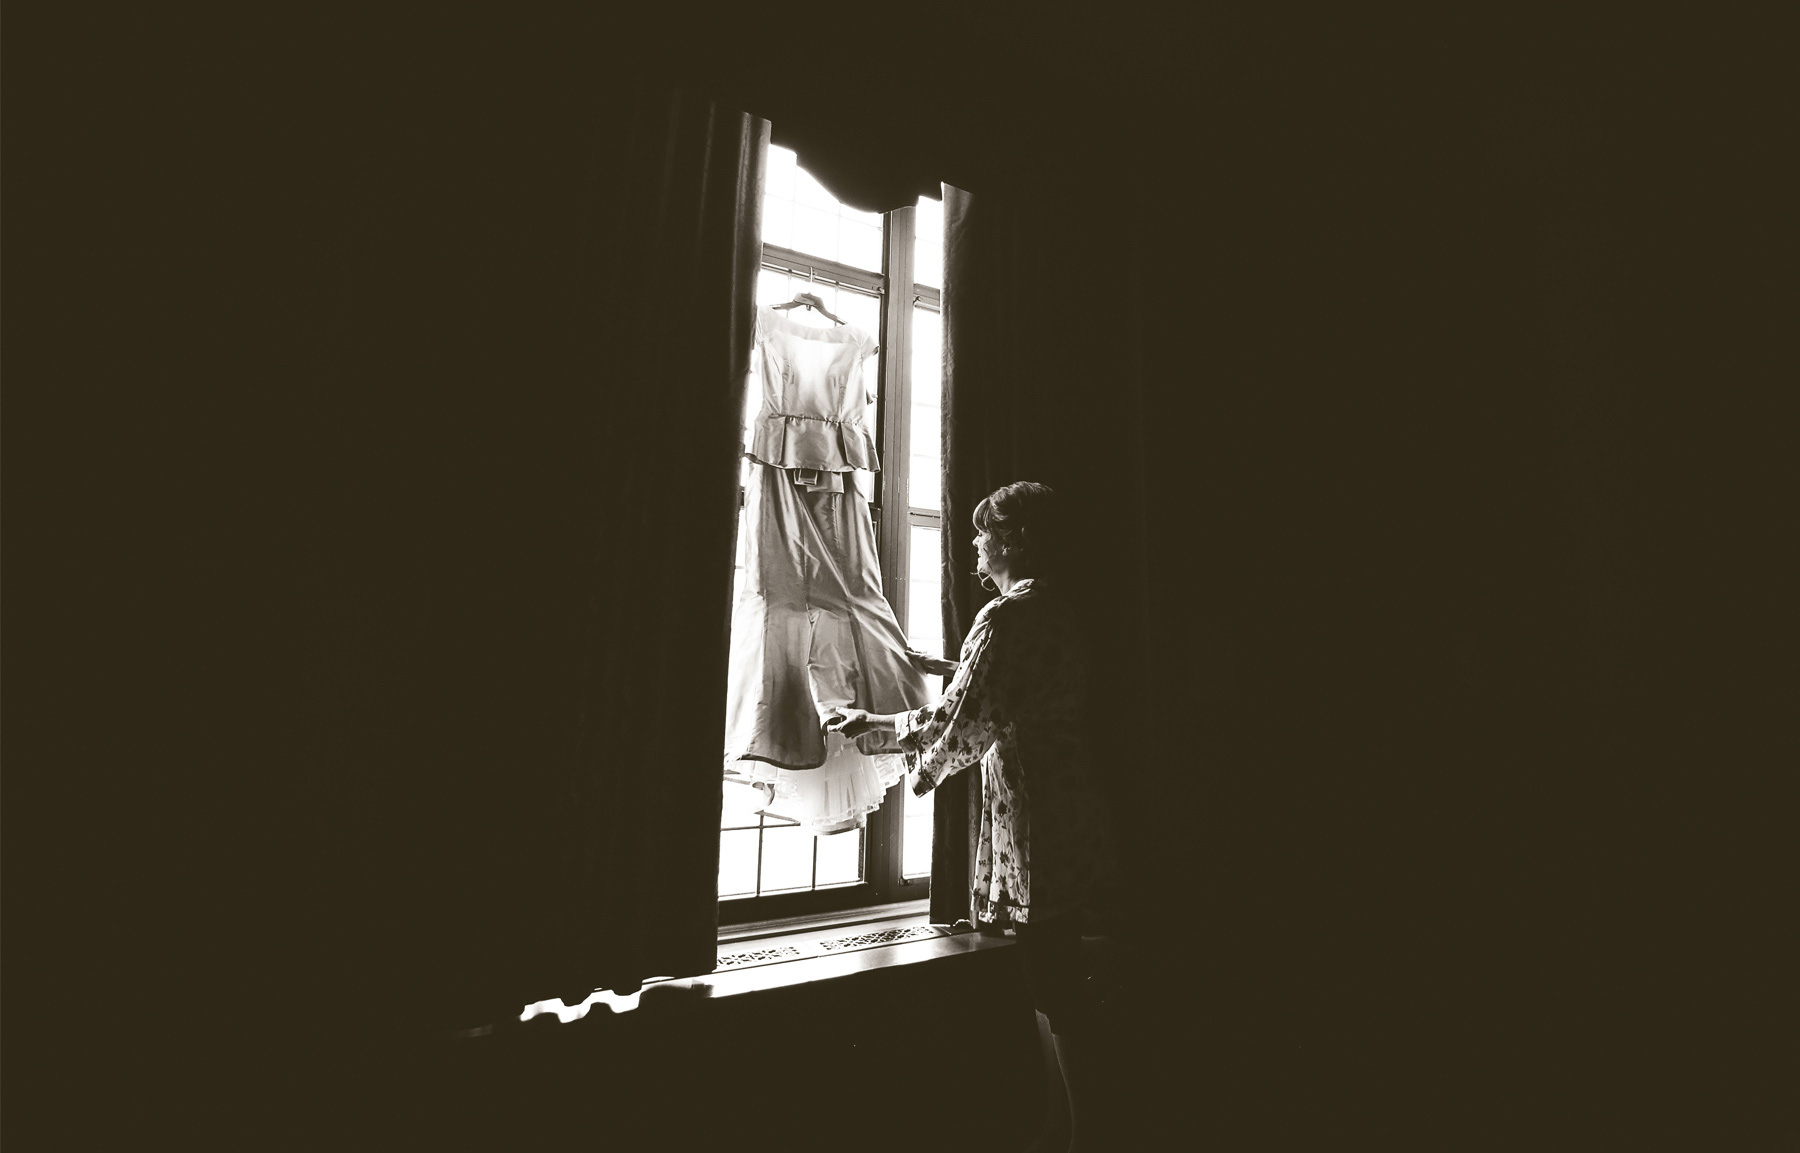 01-Minneapolis-Minnesota-Wedding-Photography-by-Vick-Photography-Downtown-The-Minneapolis-Club-Mansion-Bride-Dress-Tonia-and-Paul.jpg